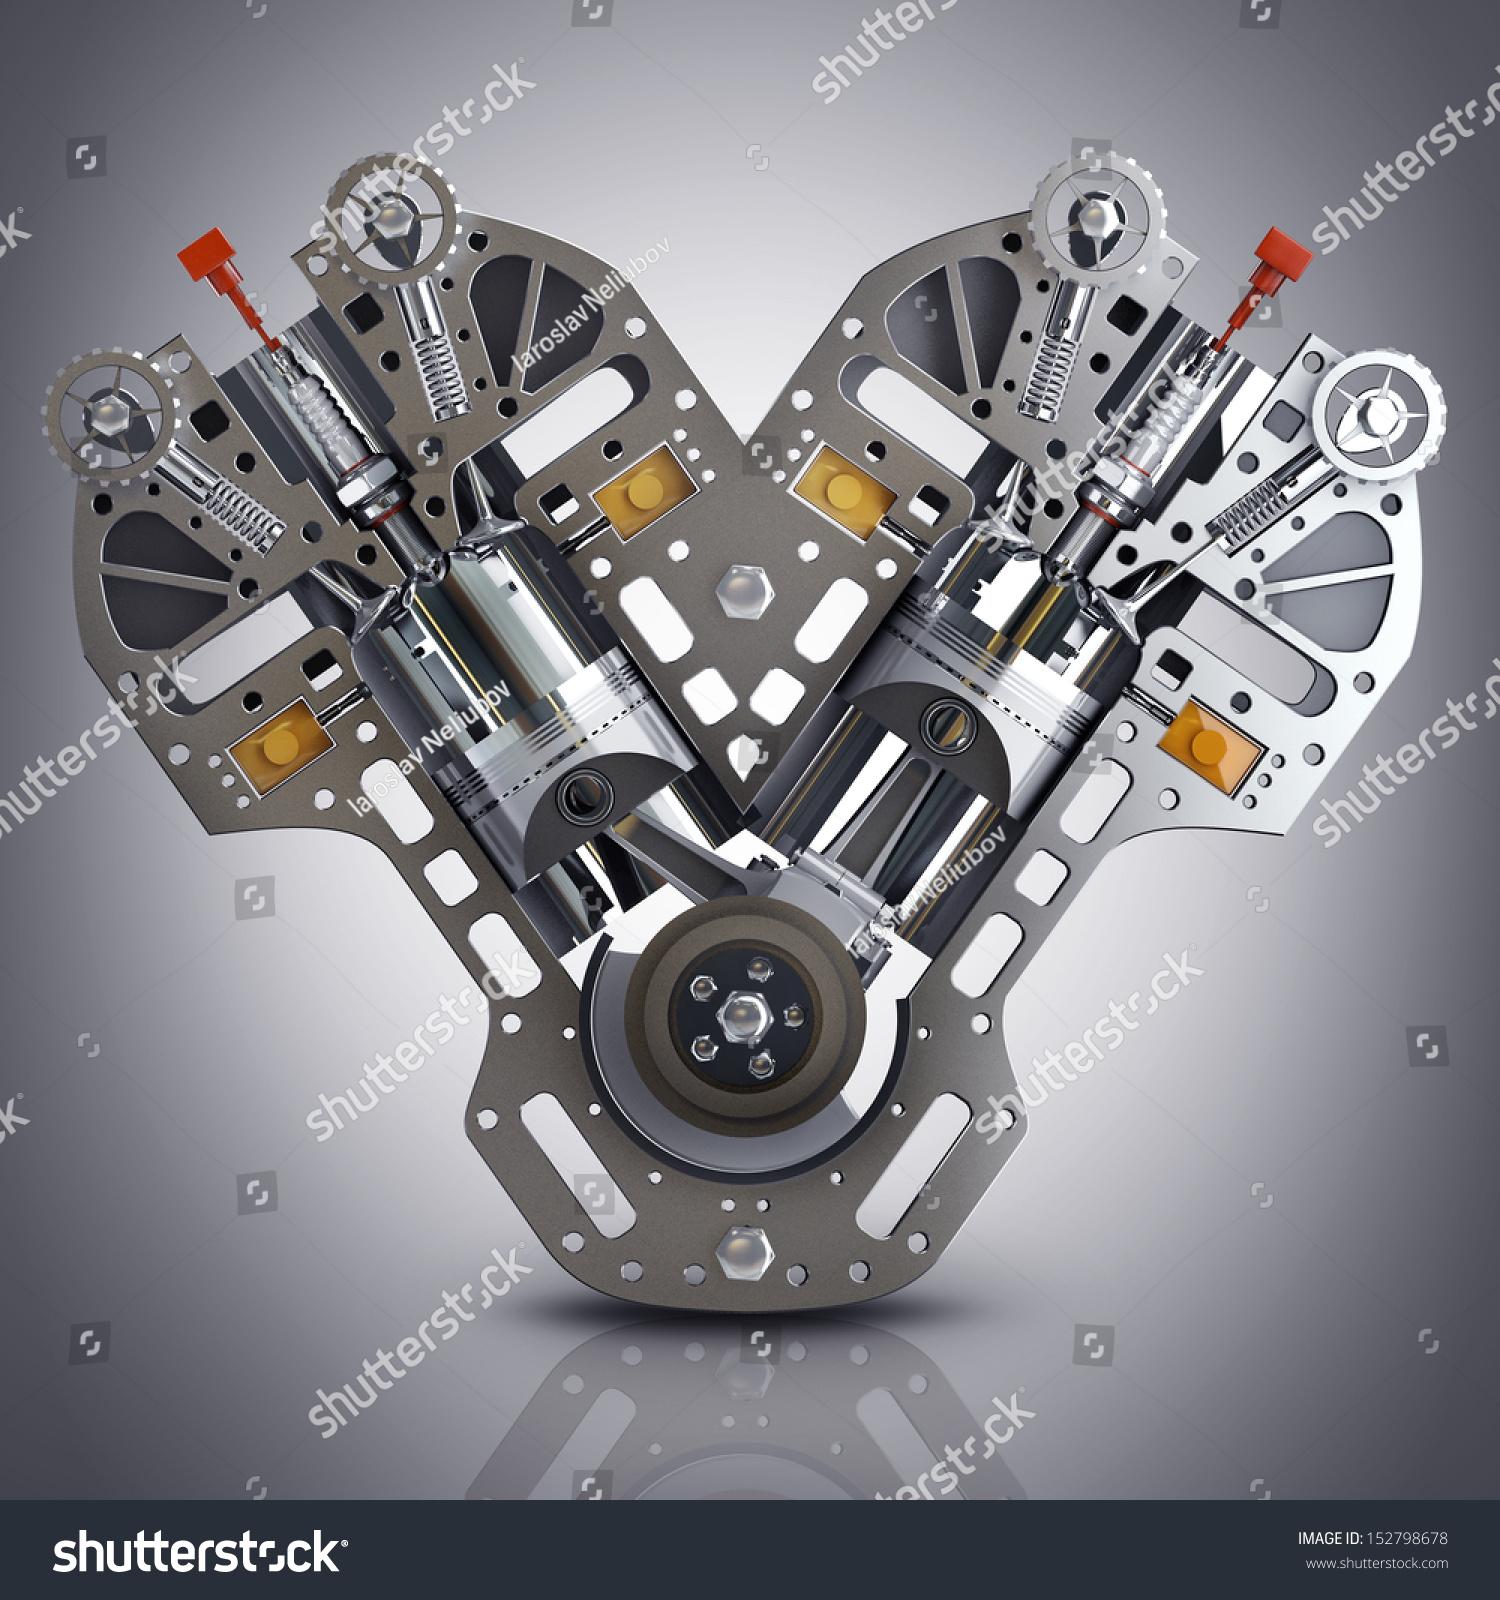 v 8 car engine concept modern carのイラスト素材 152798678 shutterstock